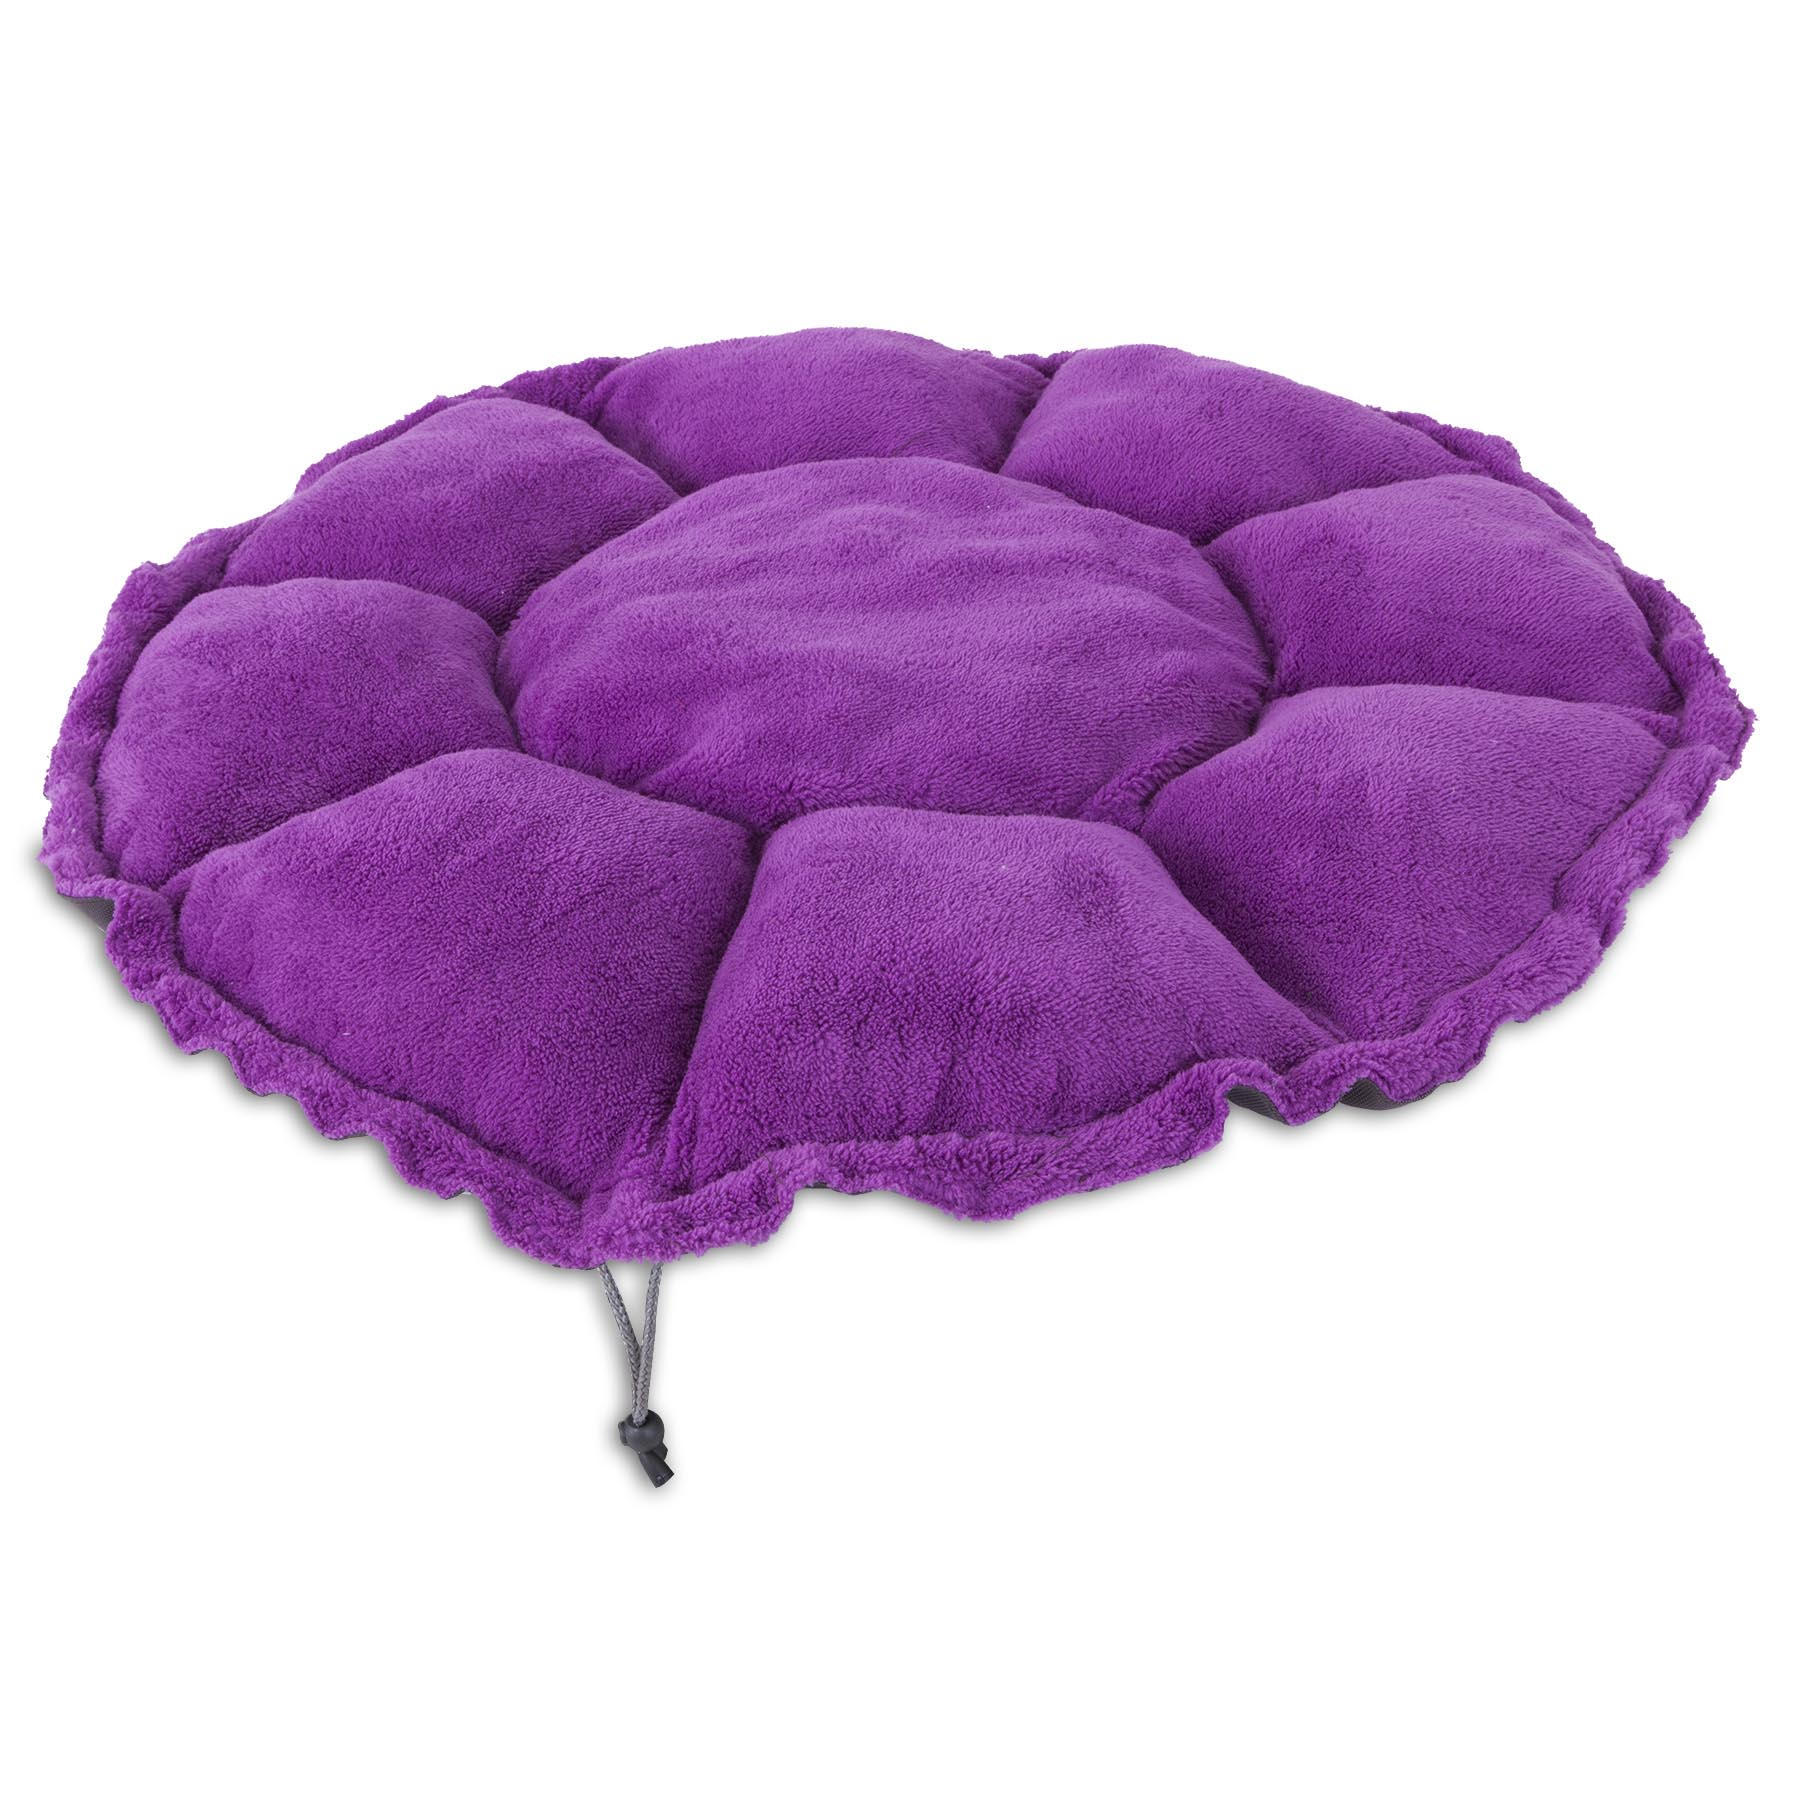 jackson galaxy comfy clamshell bed medium | cat beds | free uk p&p